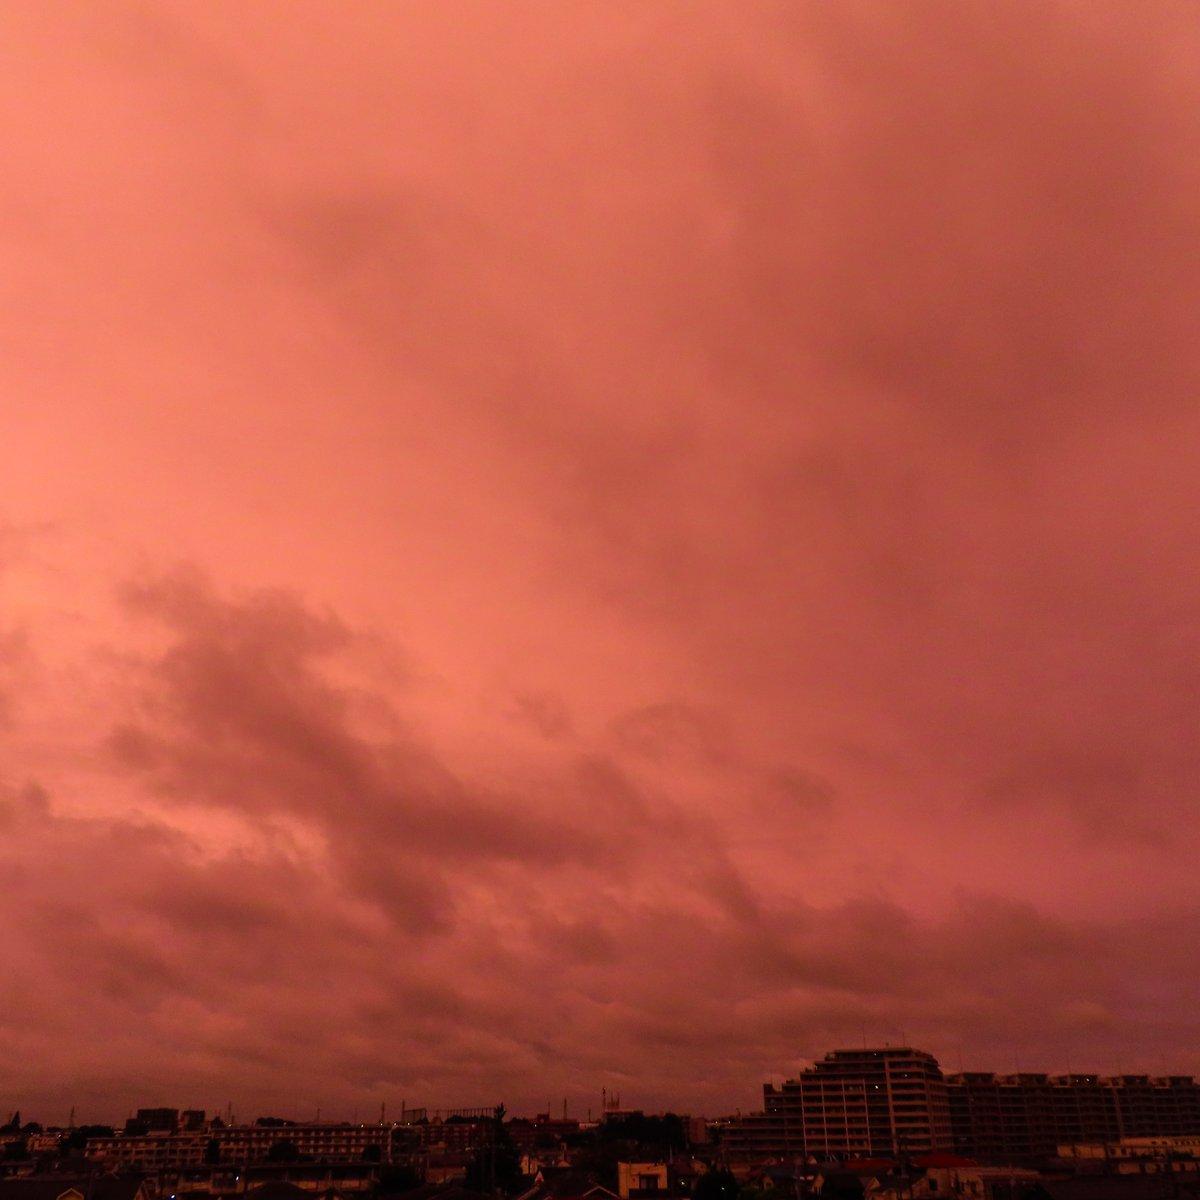 #evening #glow #sky #cloud https://t.co/rQbWybLzpm